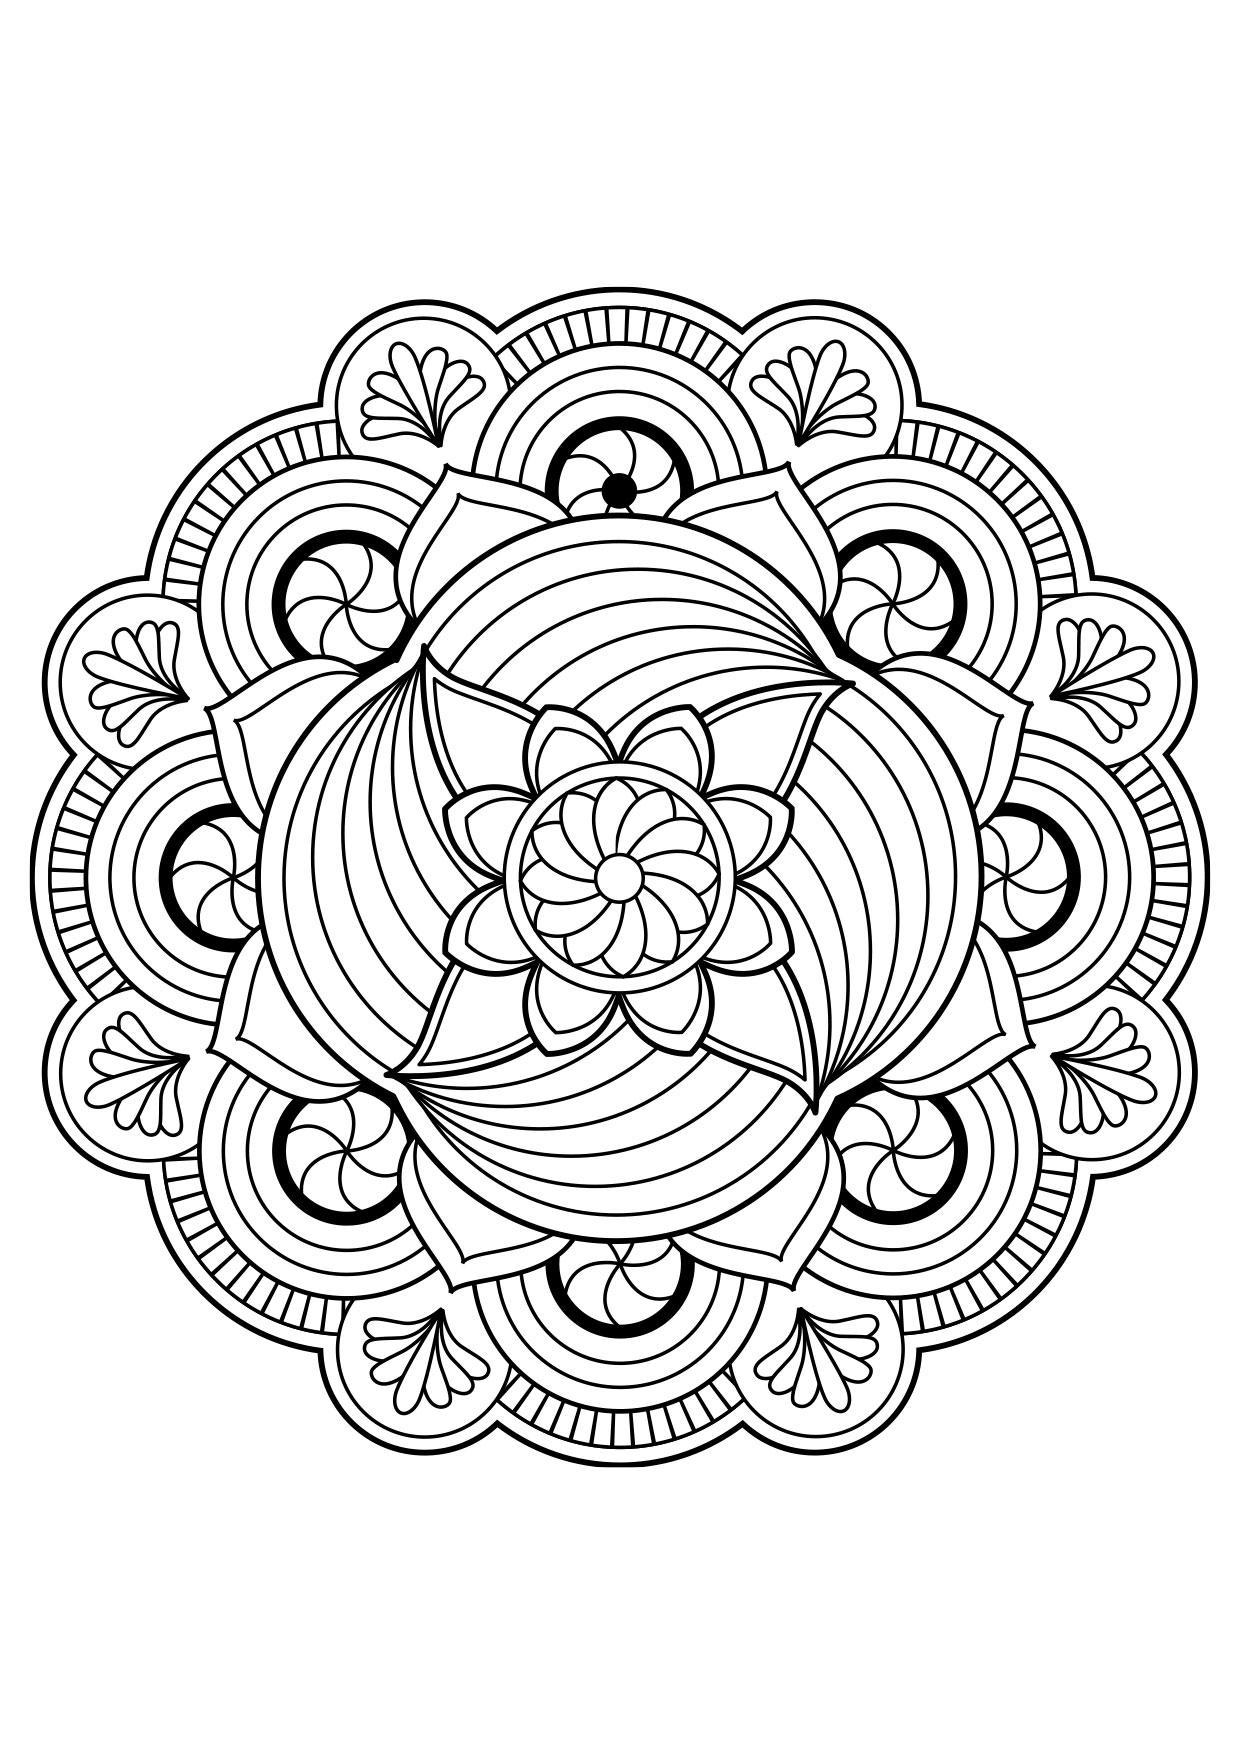 Dibujo para colorear flor de mandala - Dibujos Para ...